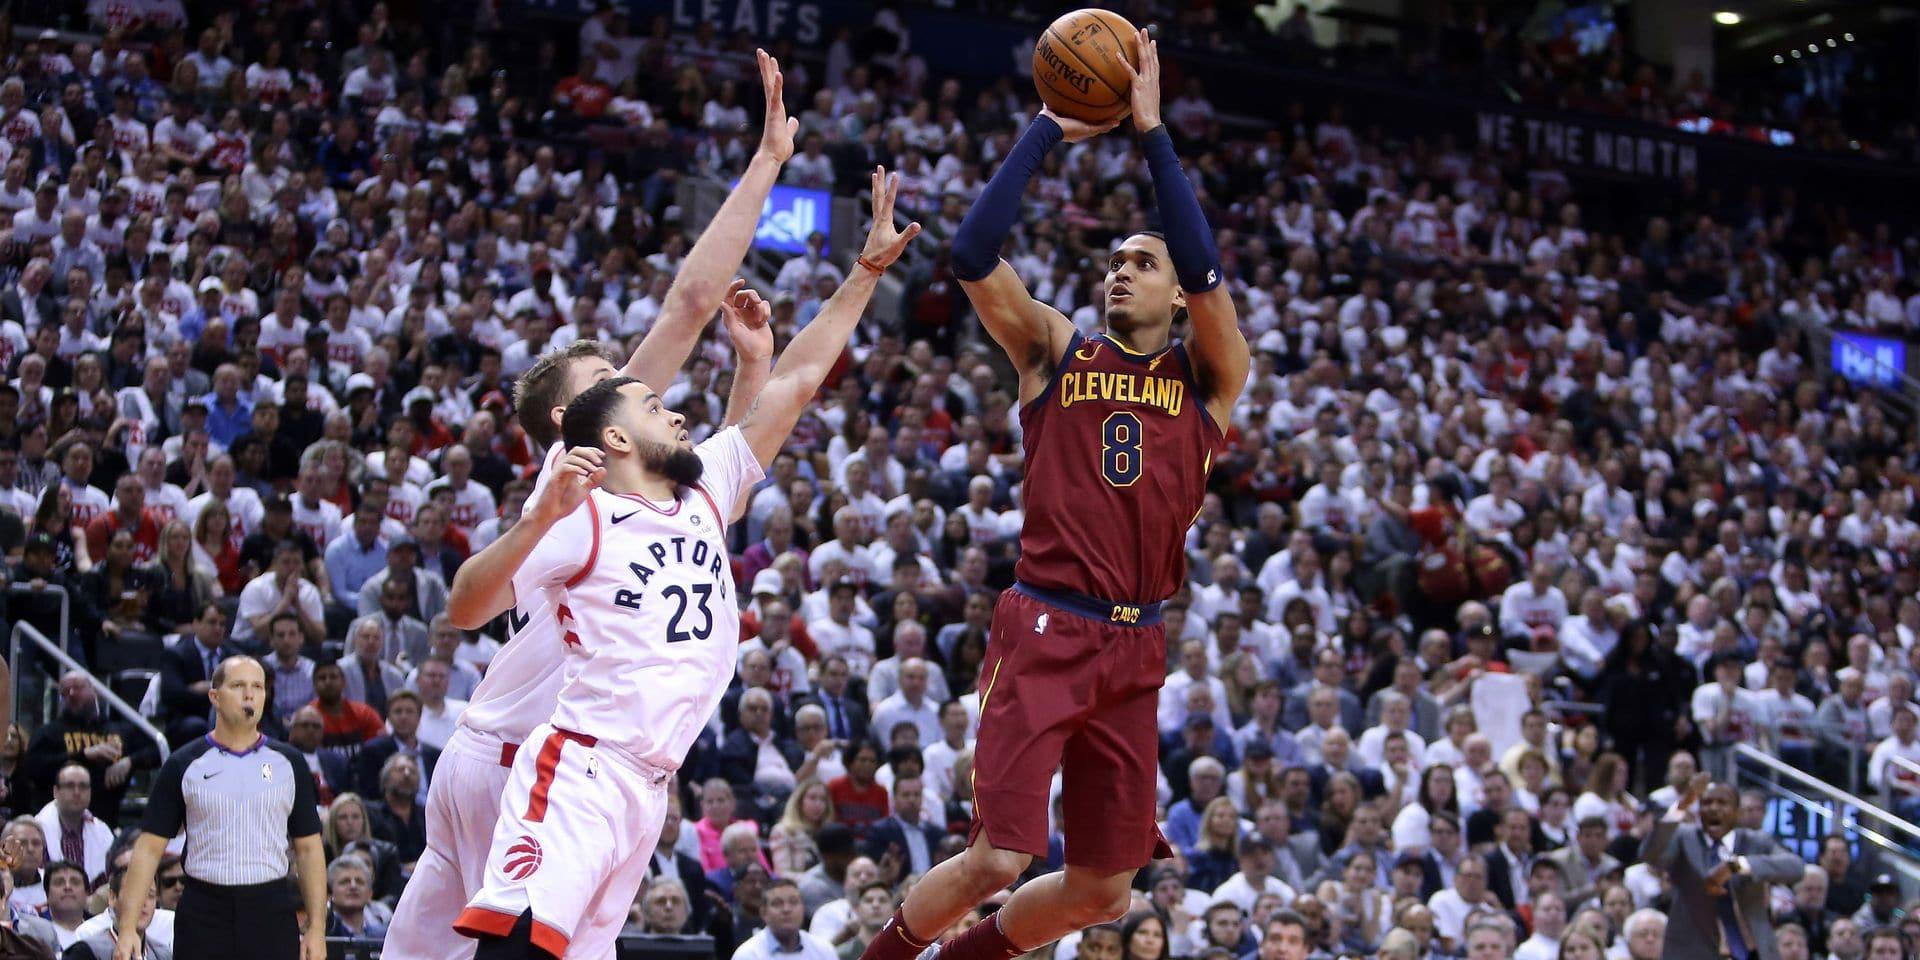 NBA: Cleveland gagne d'emblée à Toronto, Golden State assure grâce au retour de Stephen Curry